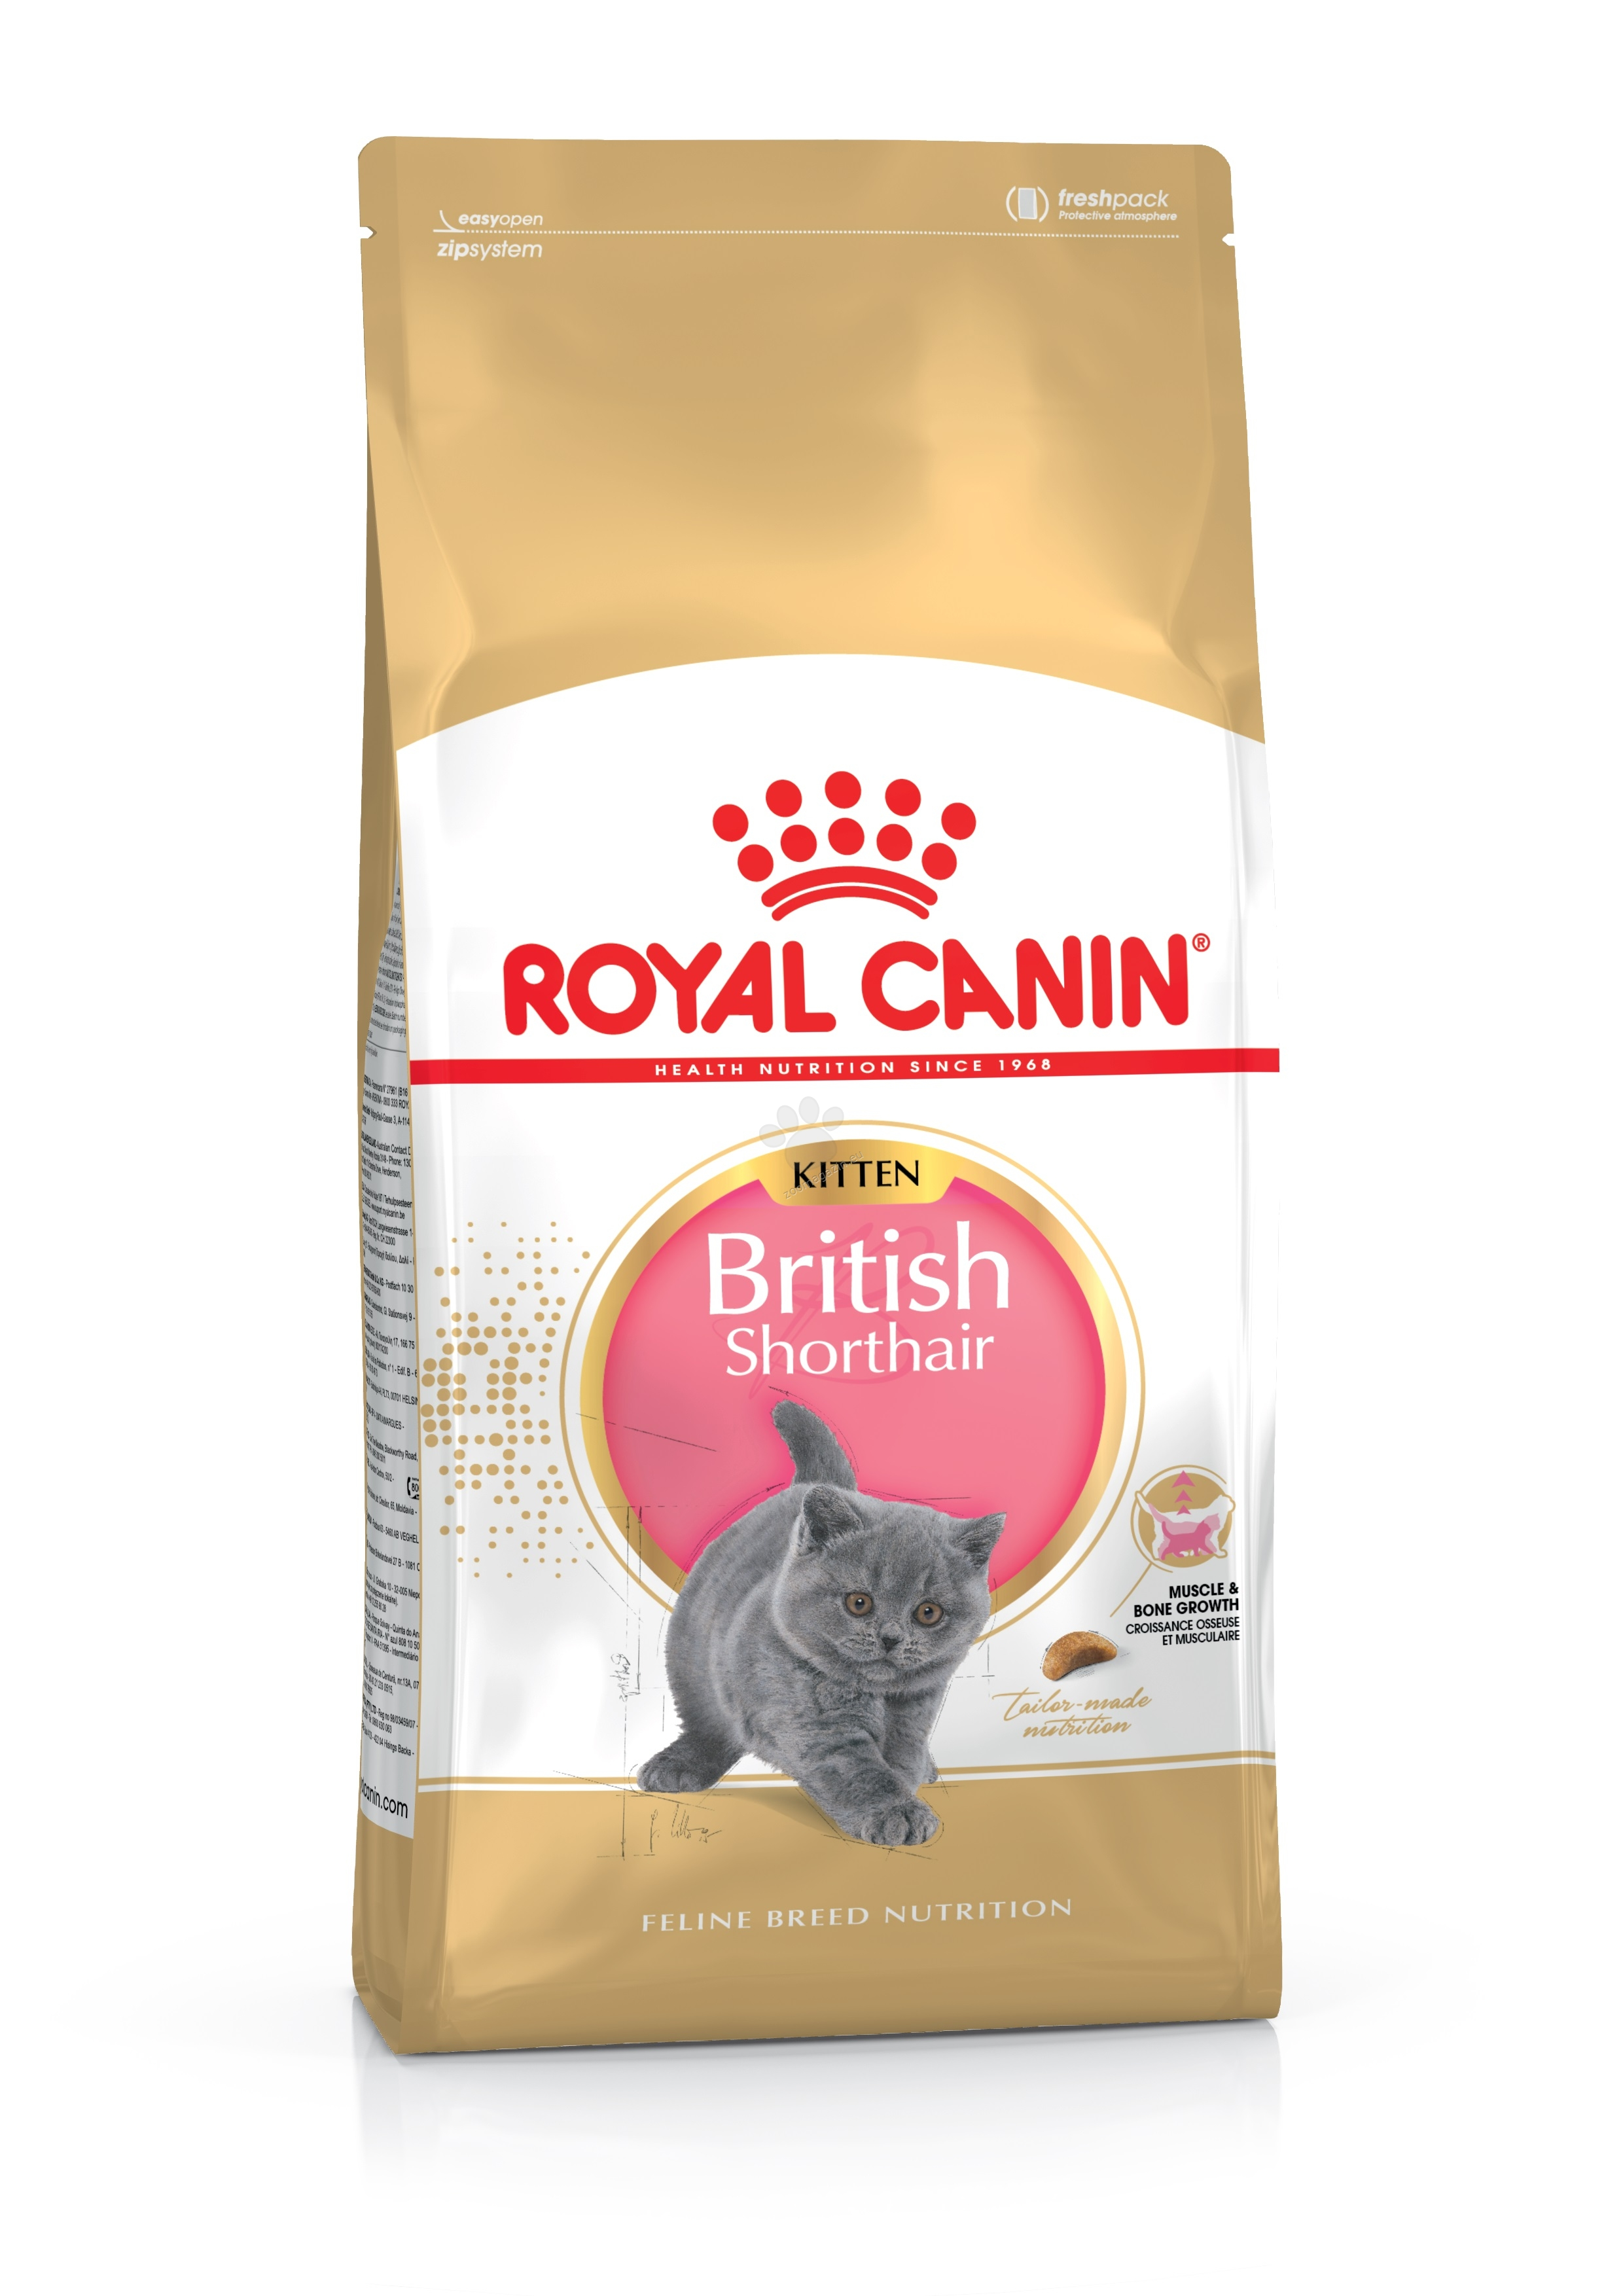 Royal Canin Kitten British Shorthair - за британска късокосместа котка от 4 до 12 месеца 10 кг.